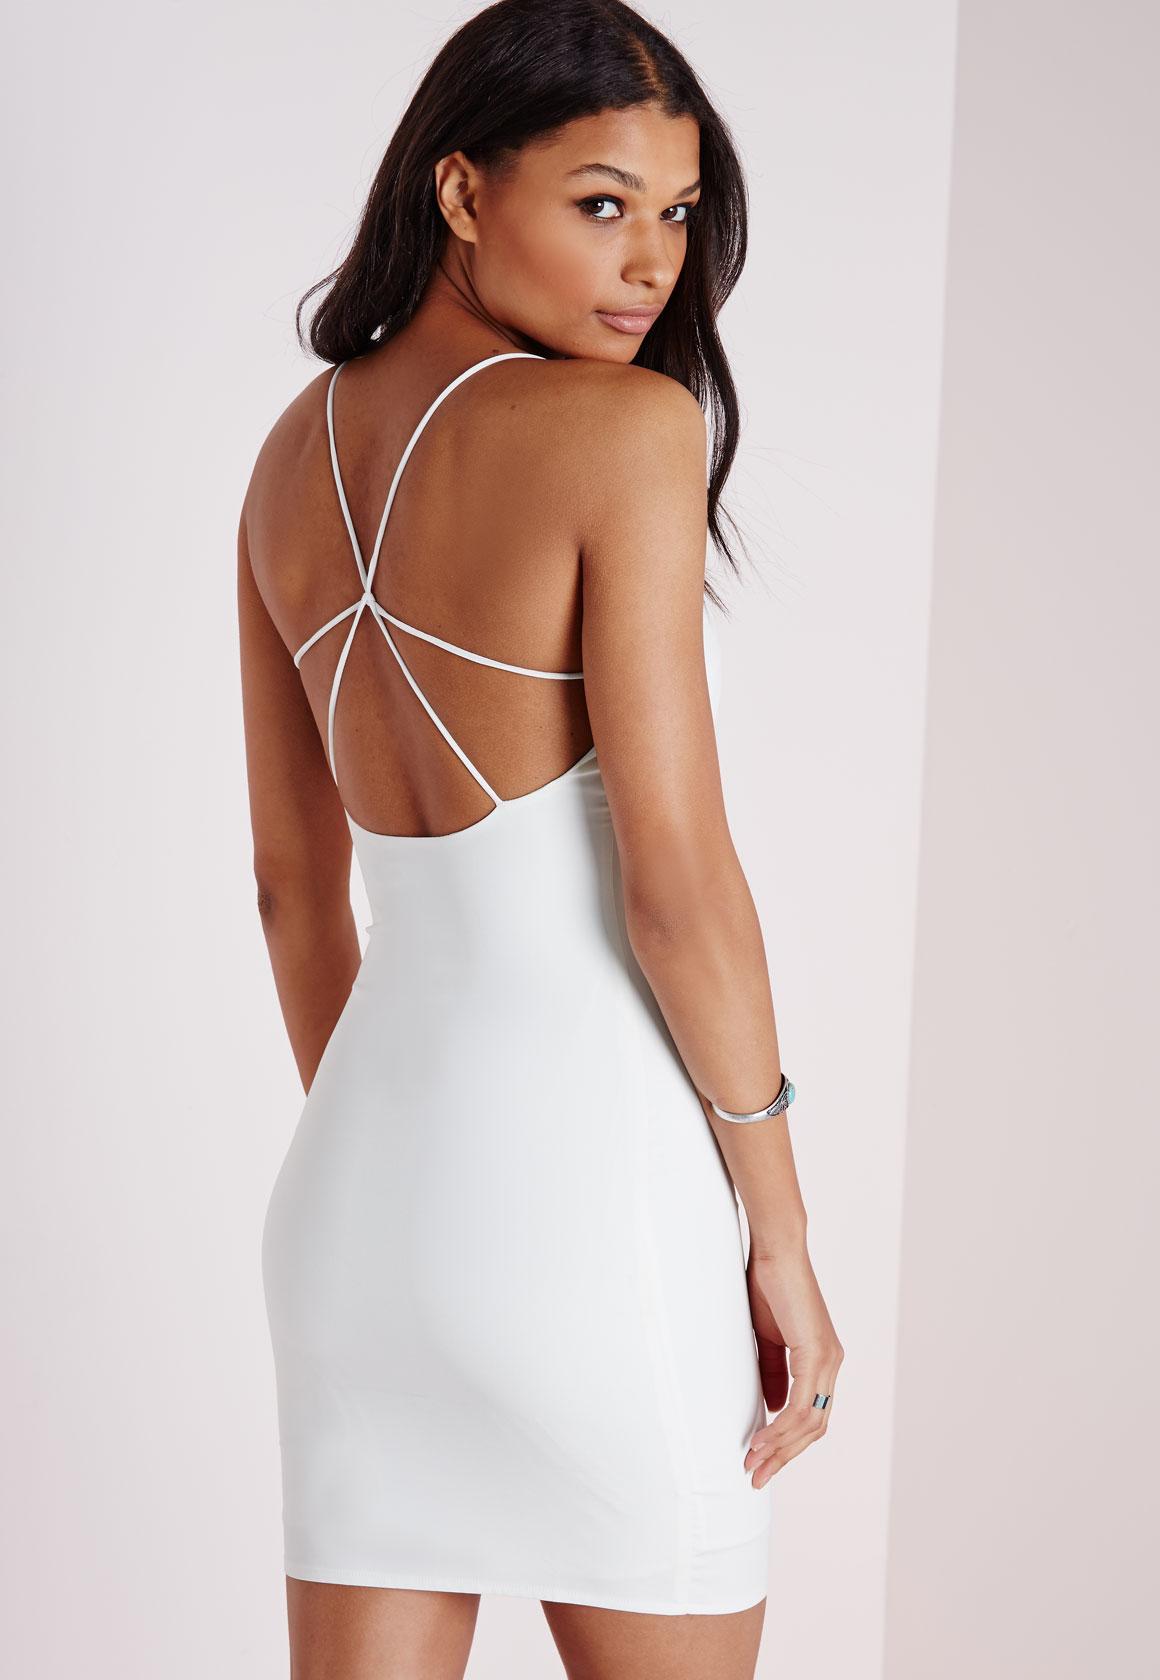 Strap Detail Mini Dress White | Missguided